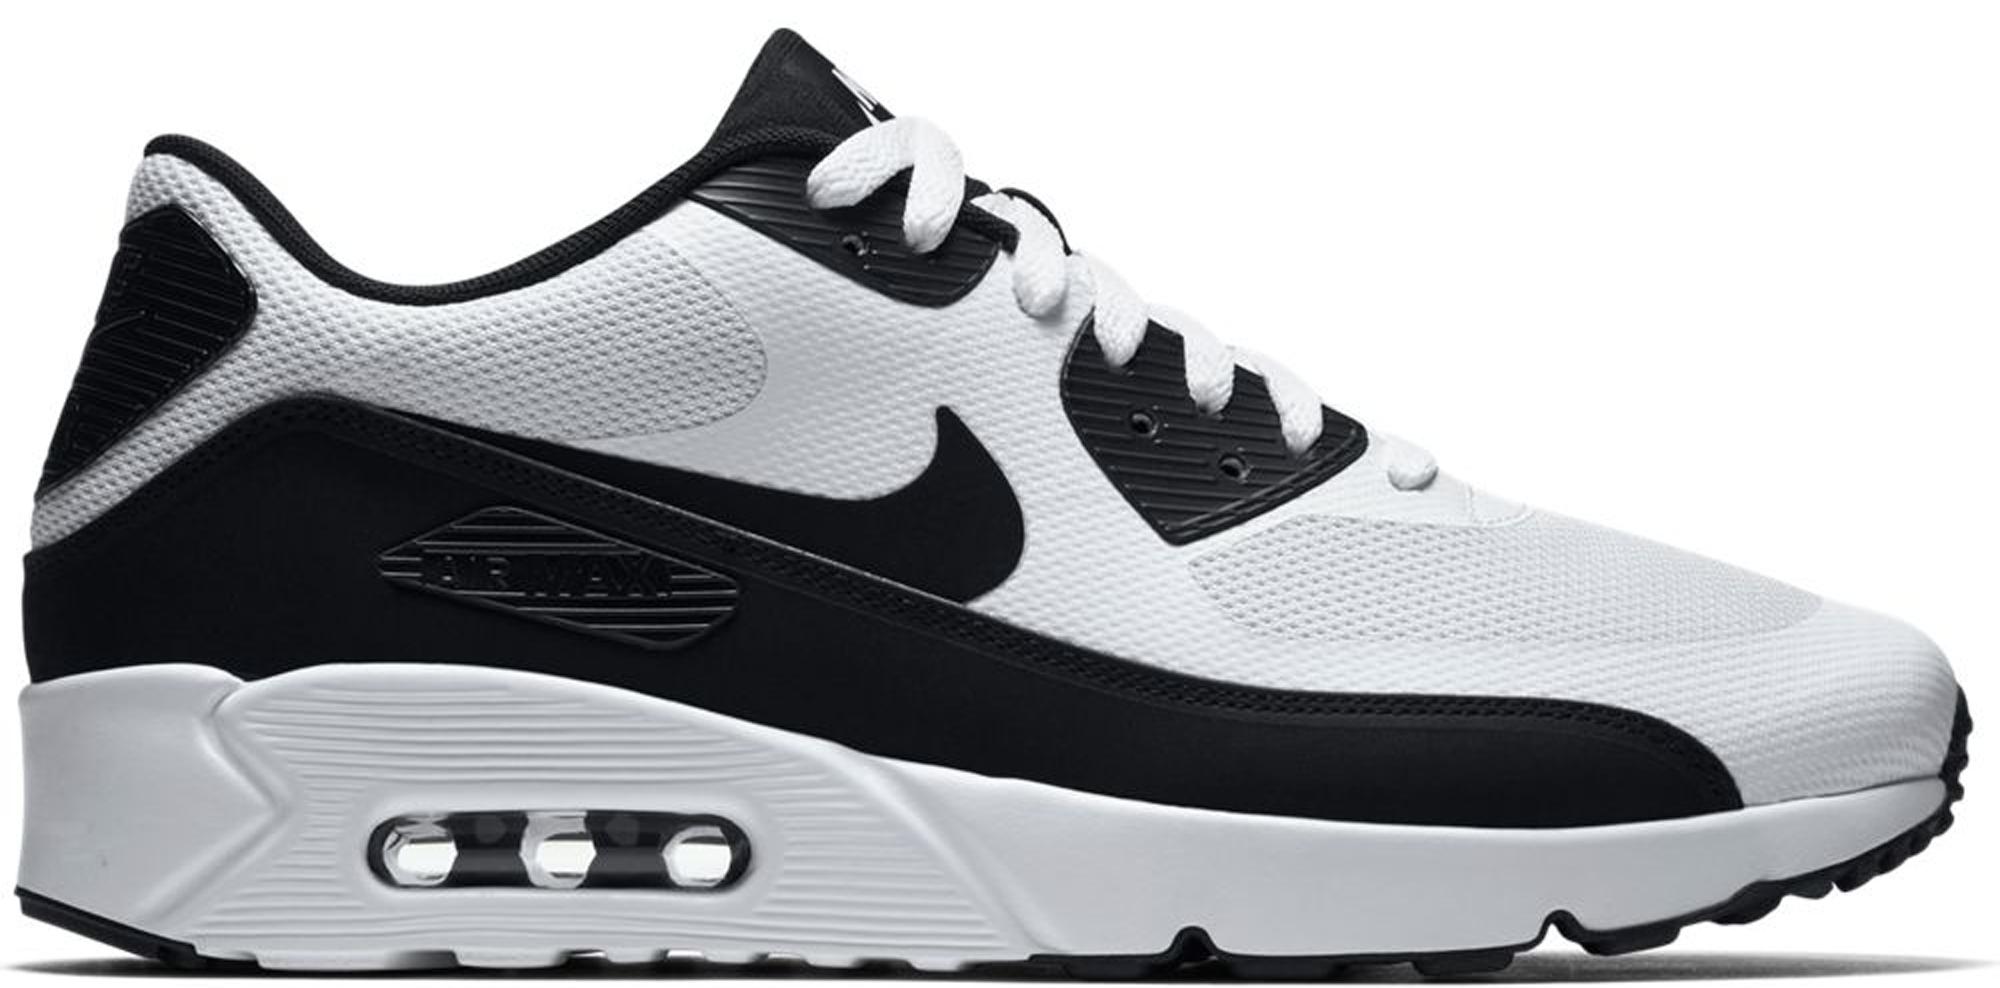 Nike Air Max 90 Ultra 2.0 White Black